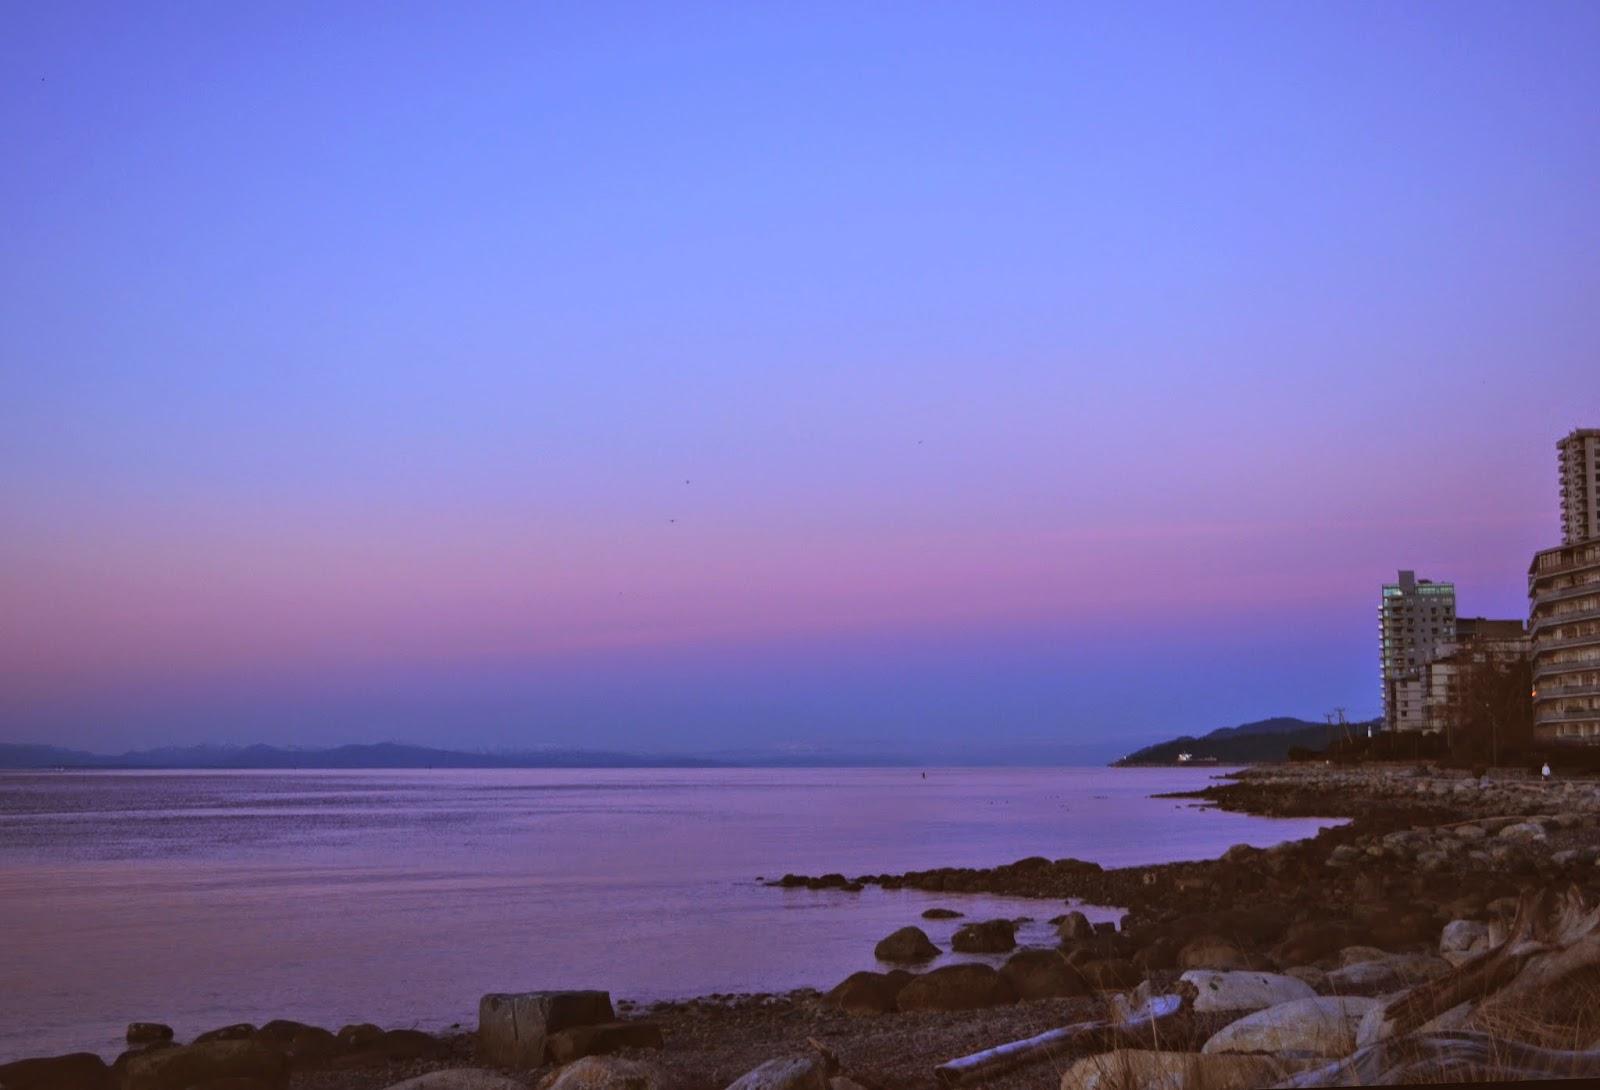 Ambleside Beach Sunrise by Northern Rustication